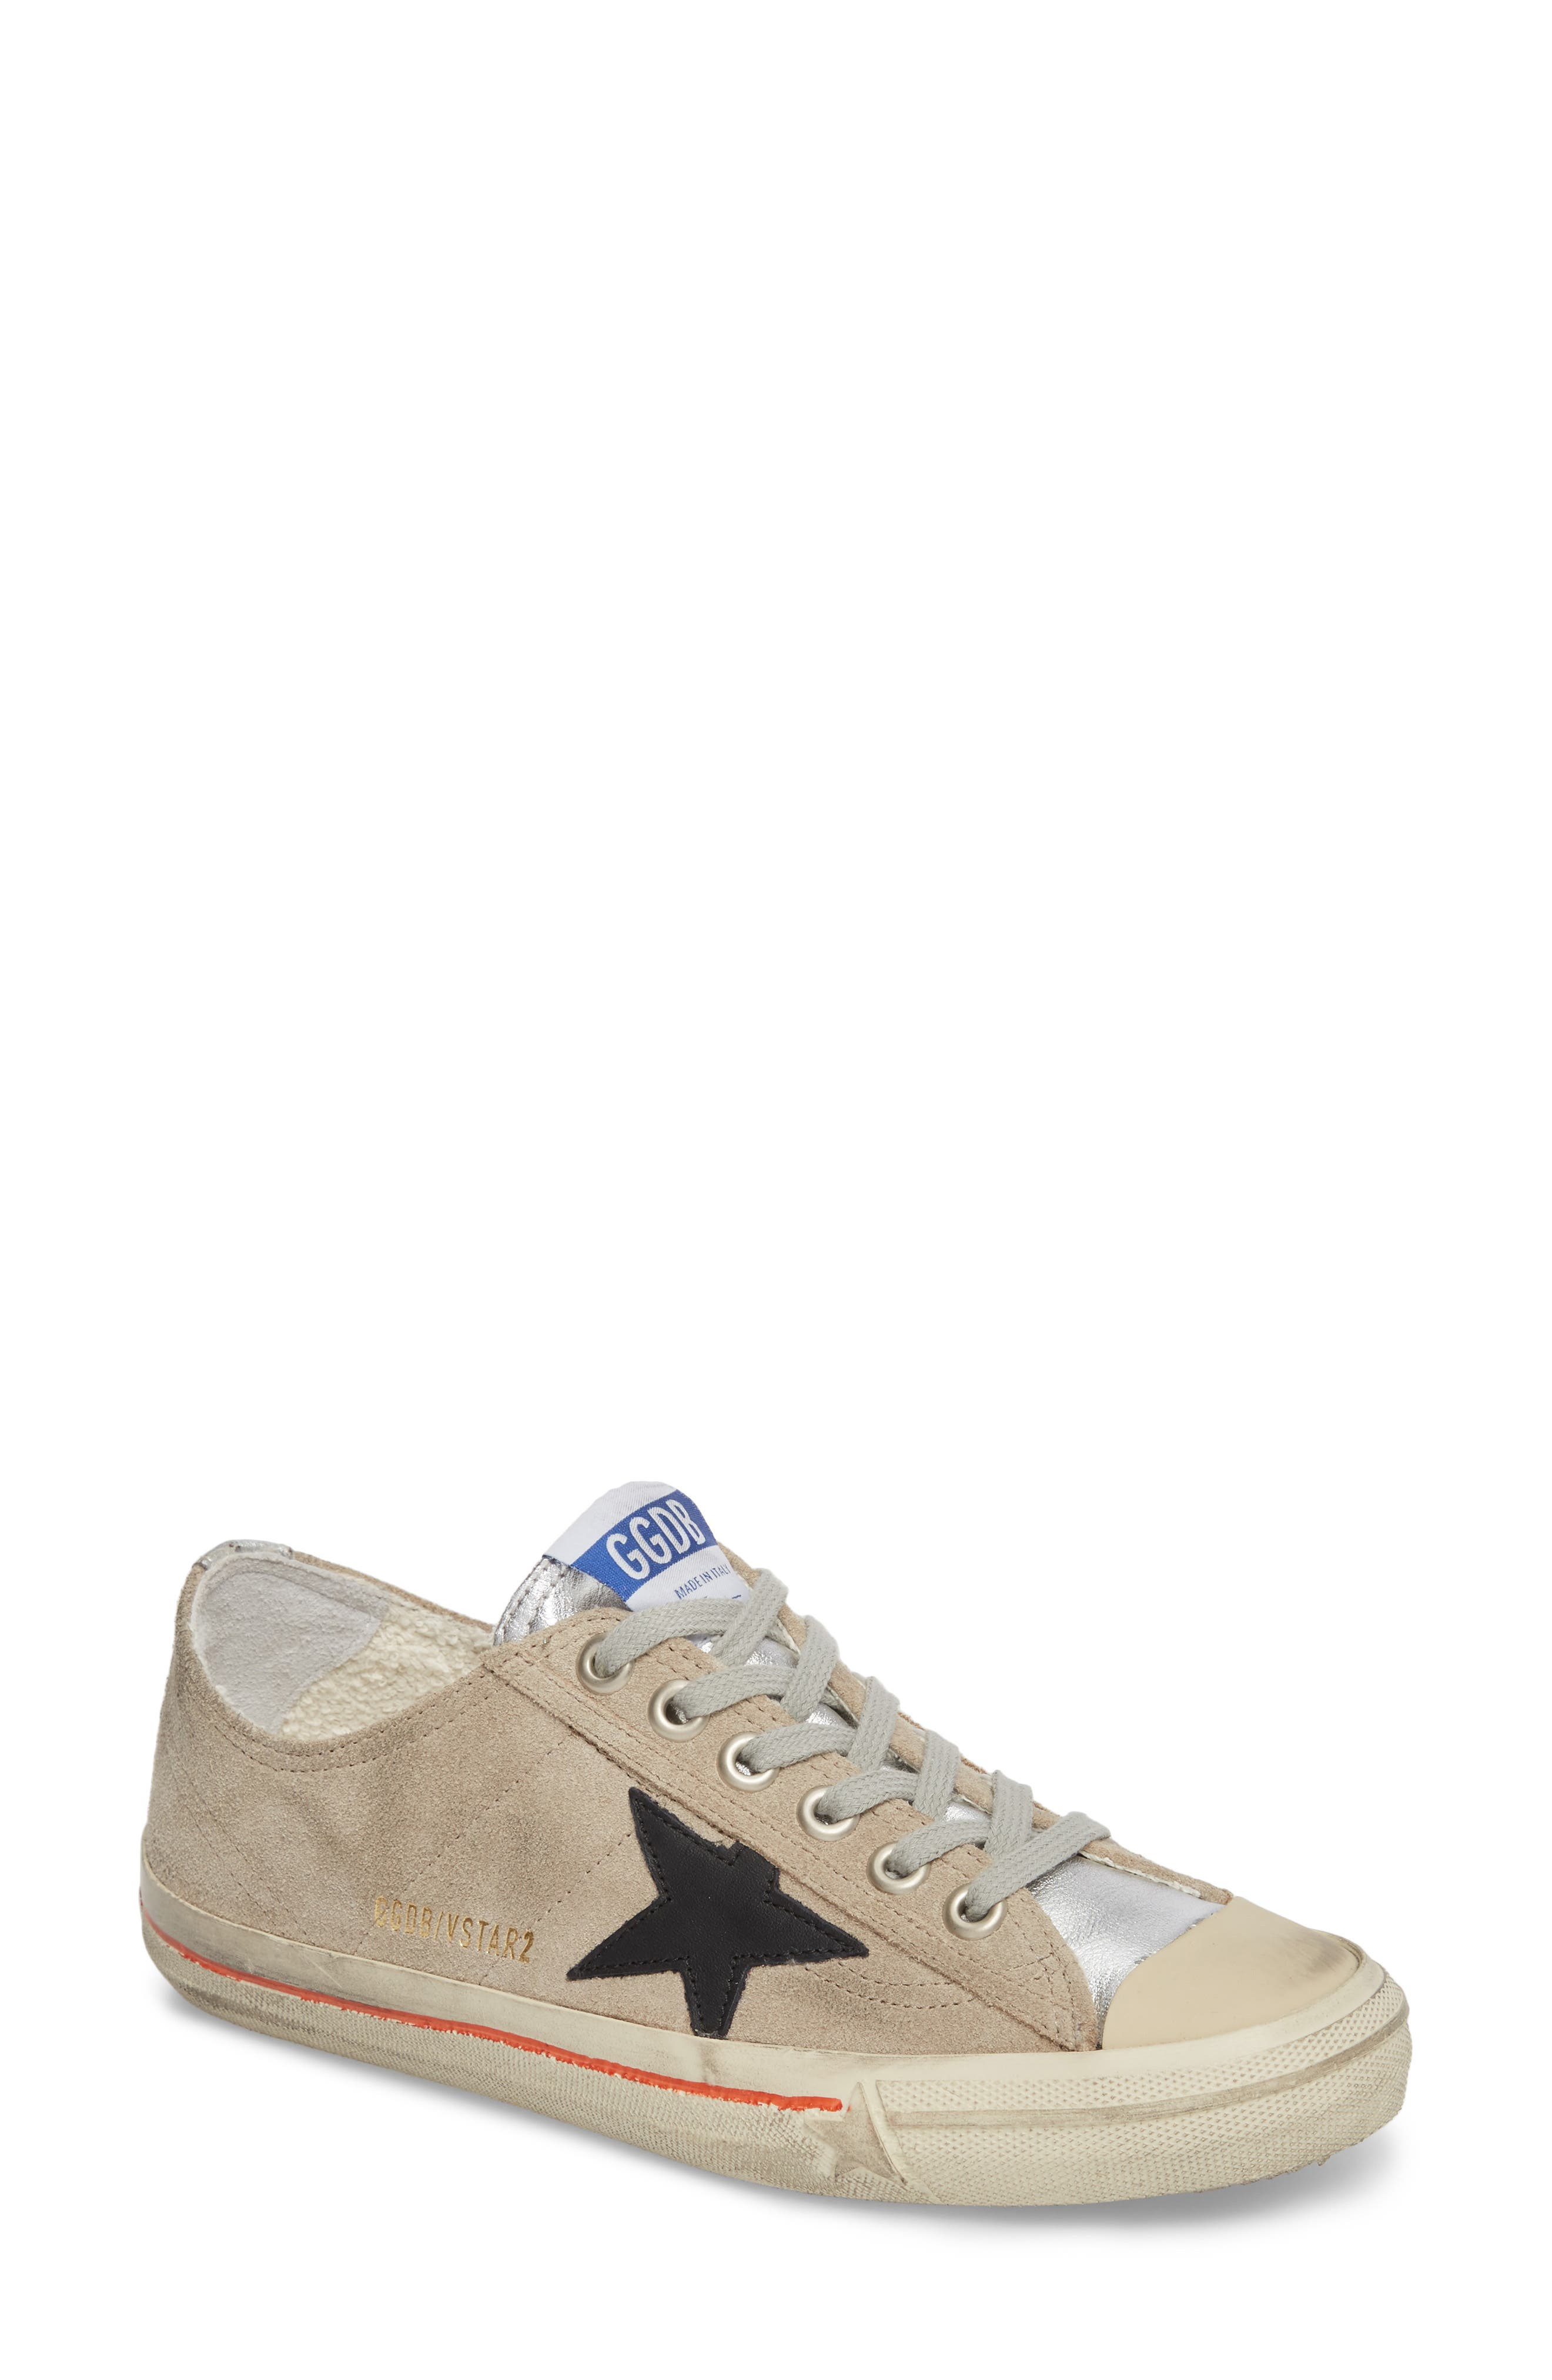 V-Star 2 Low Top Sneaker,                         Main,                         color, 020